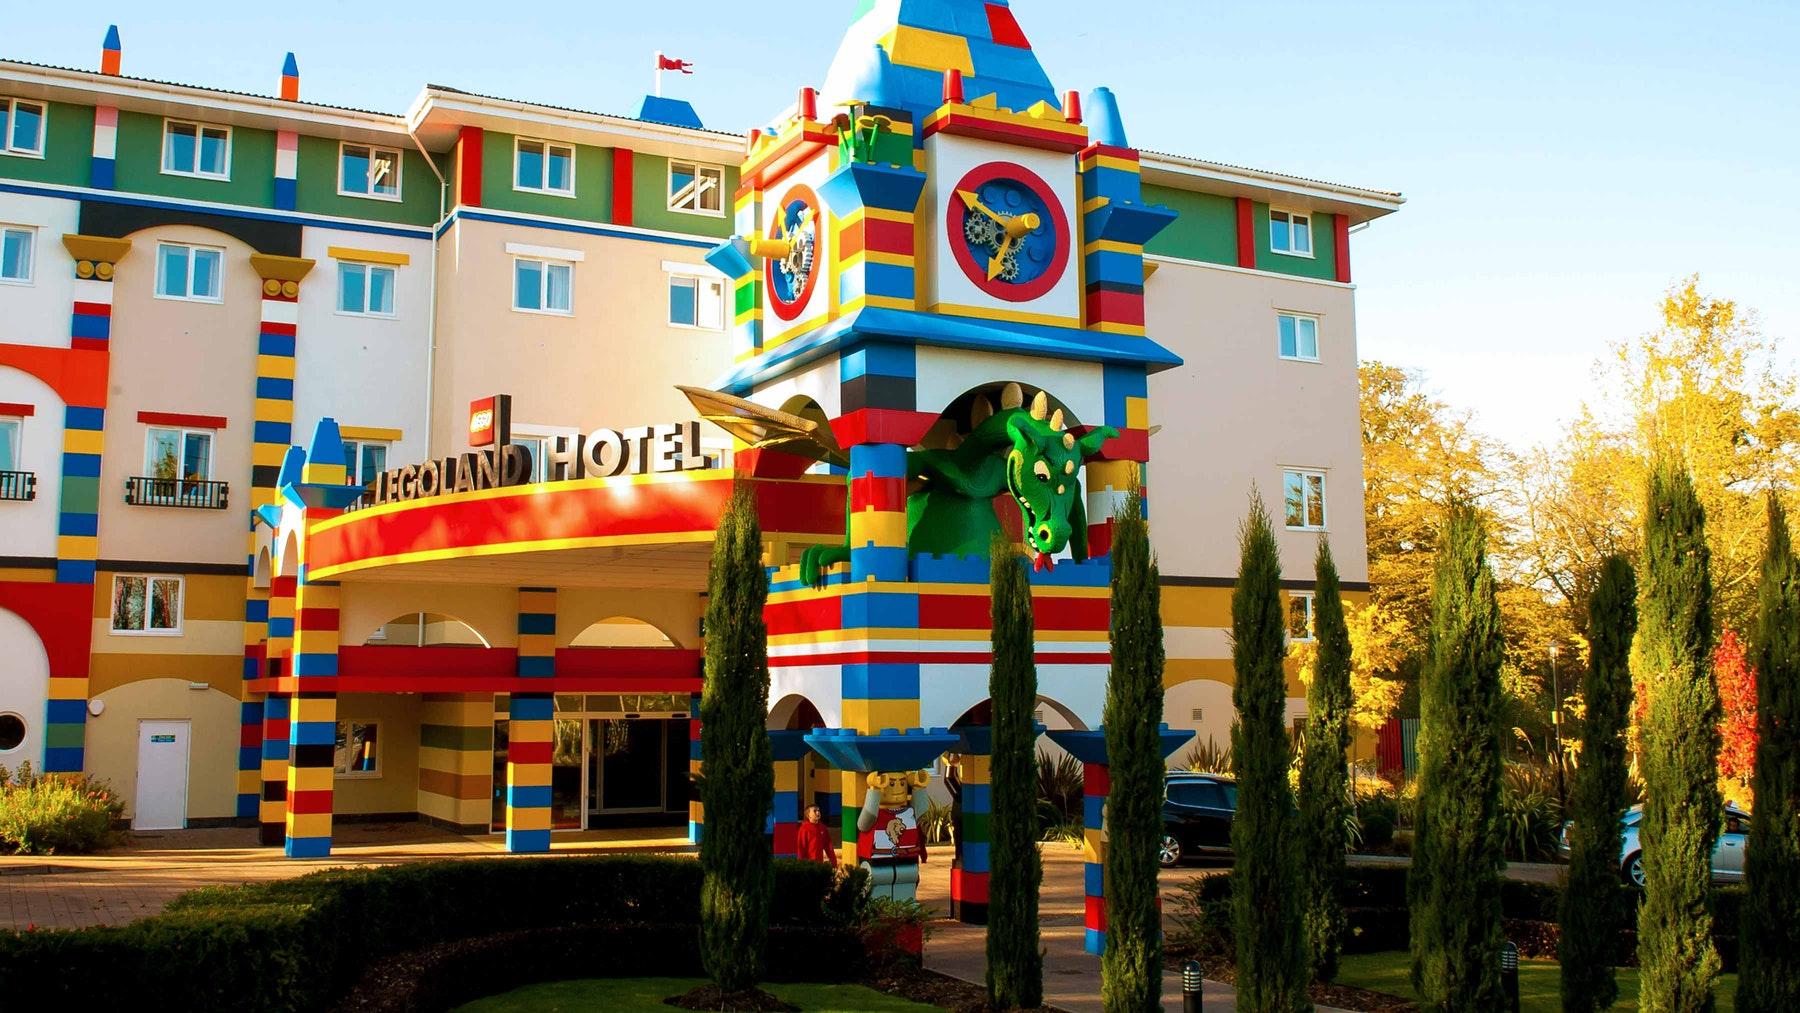 Legoland Windsor Hotel Winter Escape - bed & breakfast currently £99 for weekends in November